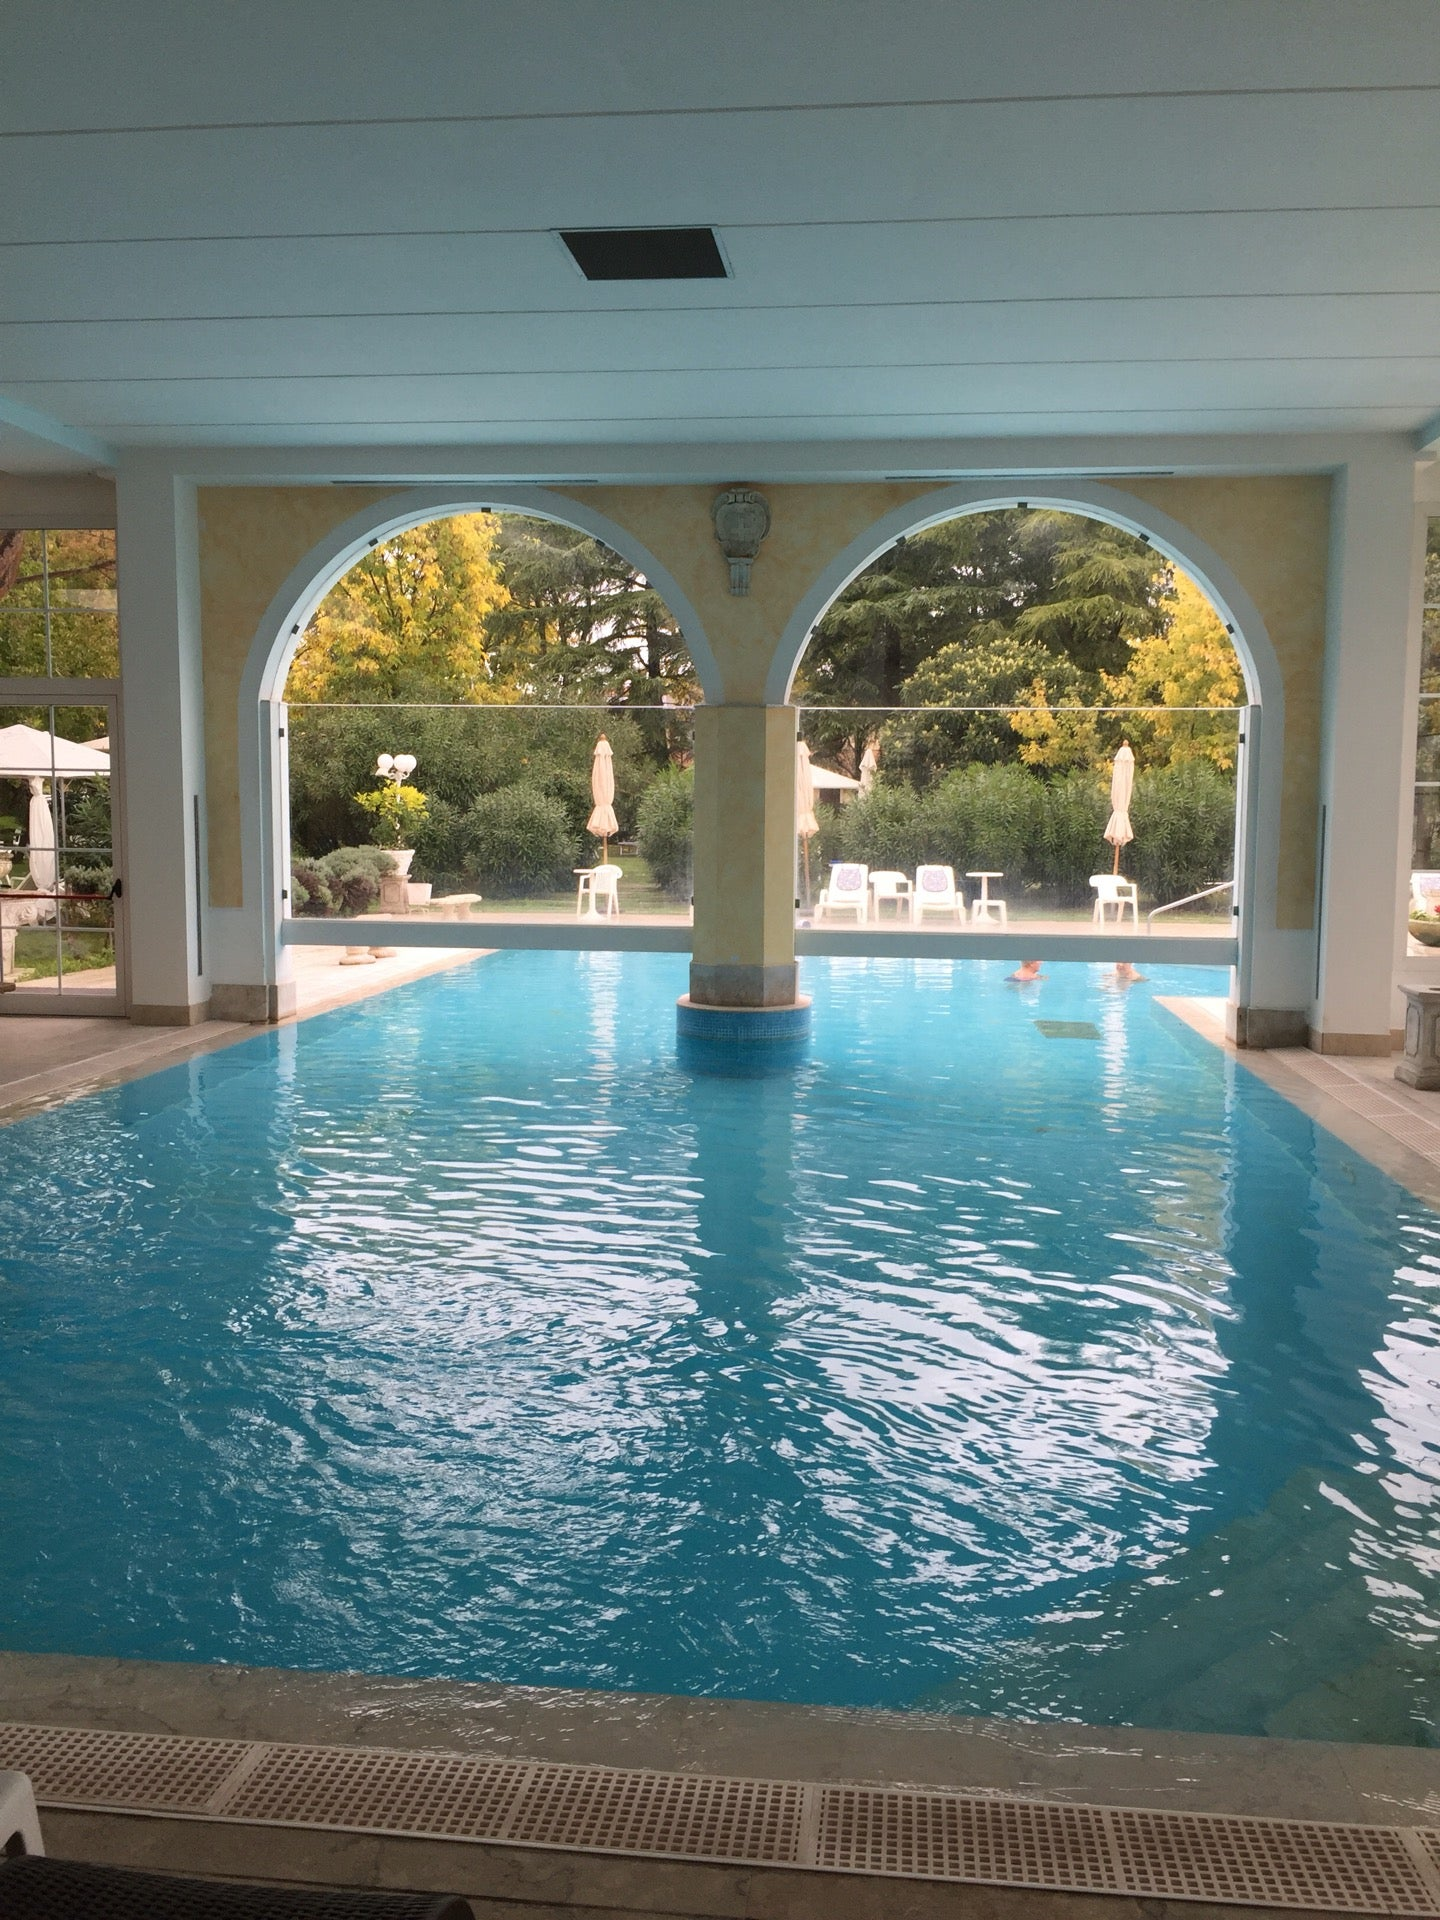 Offerte Hotel Firenze Mezza Pensione